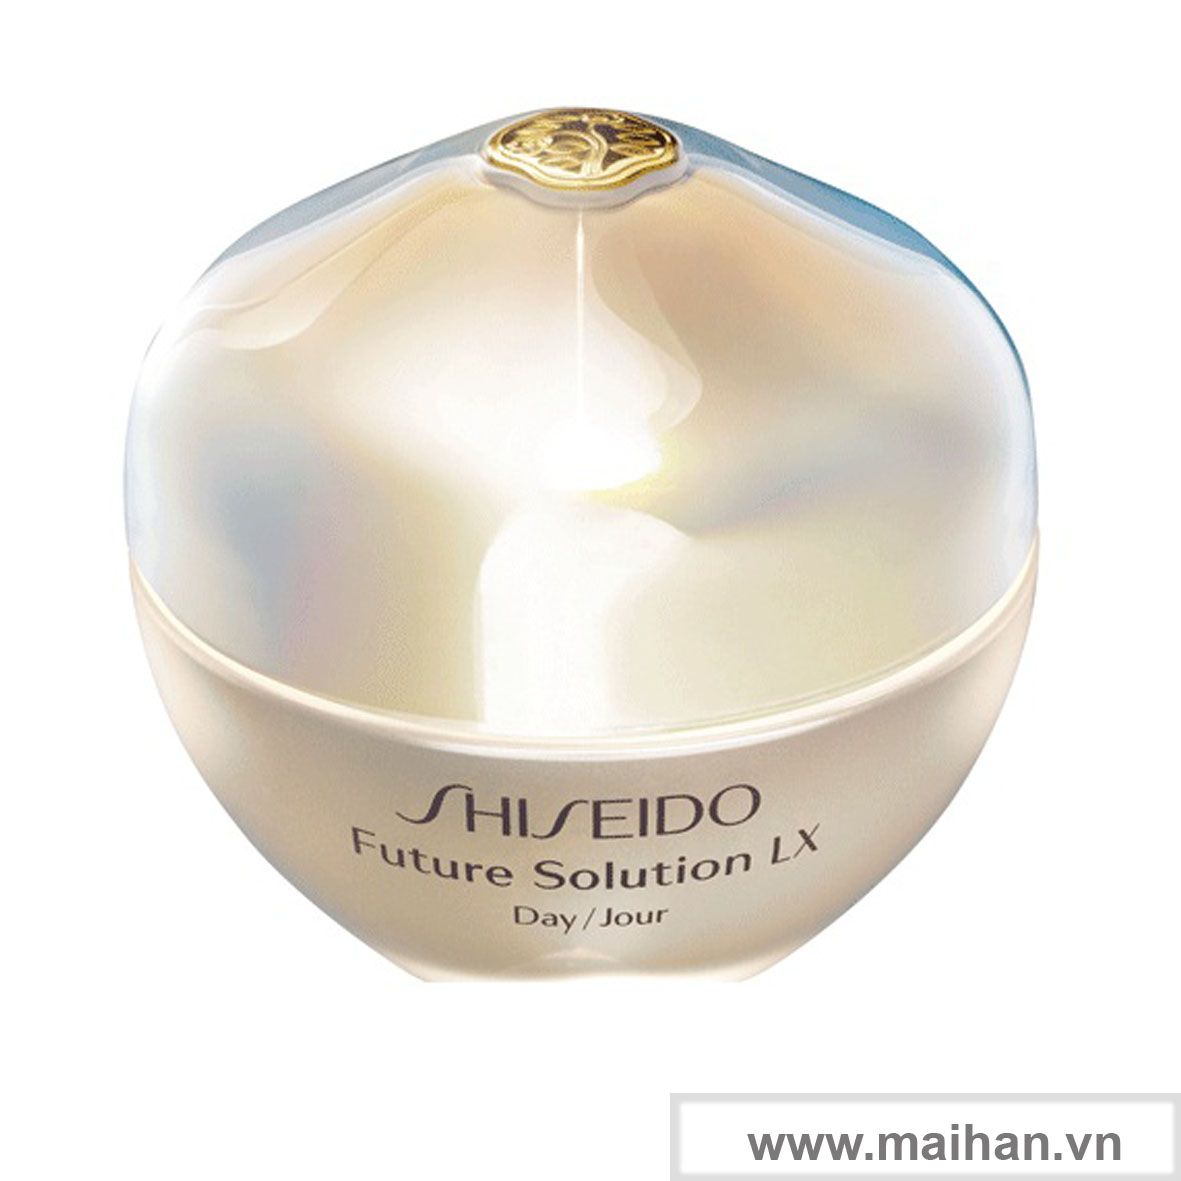 Kem dưỡng ngày Shiseido Future Solution LX Total Protective Cream